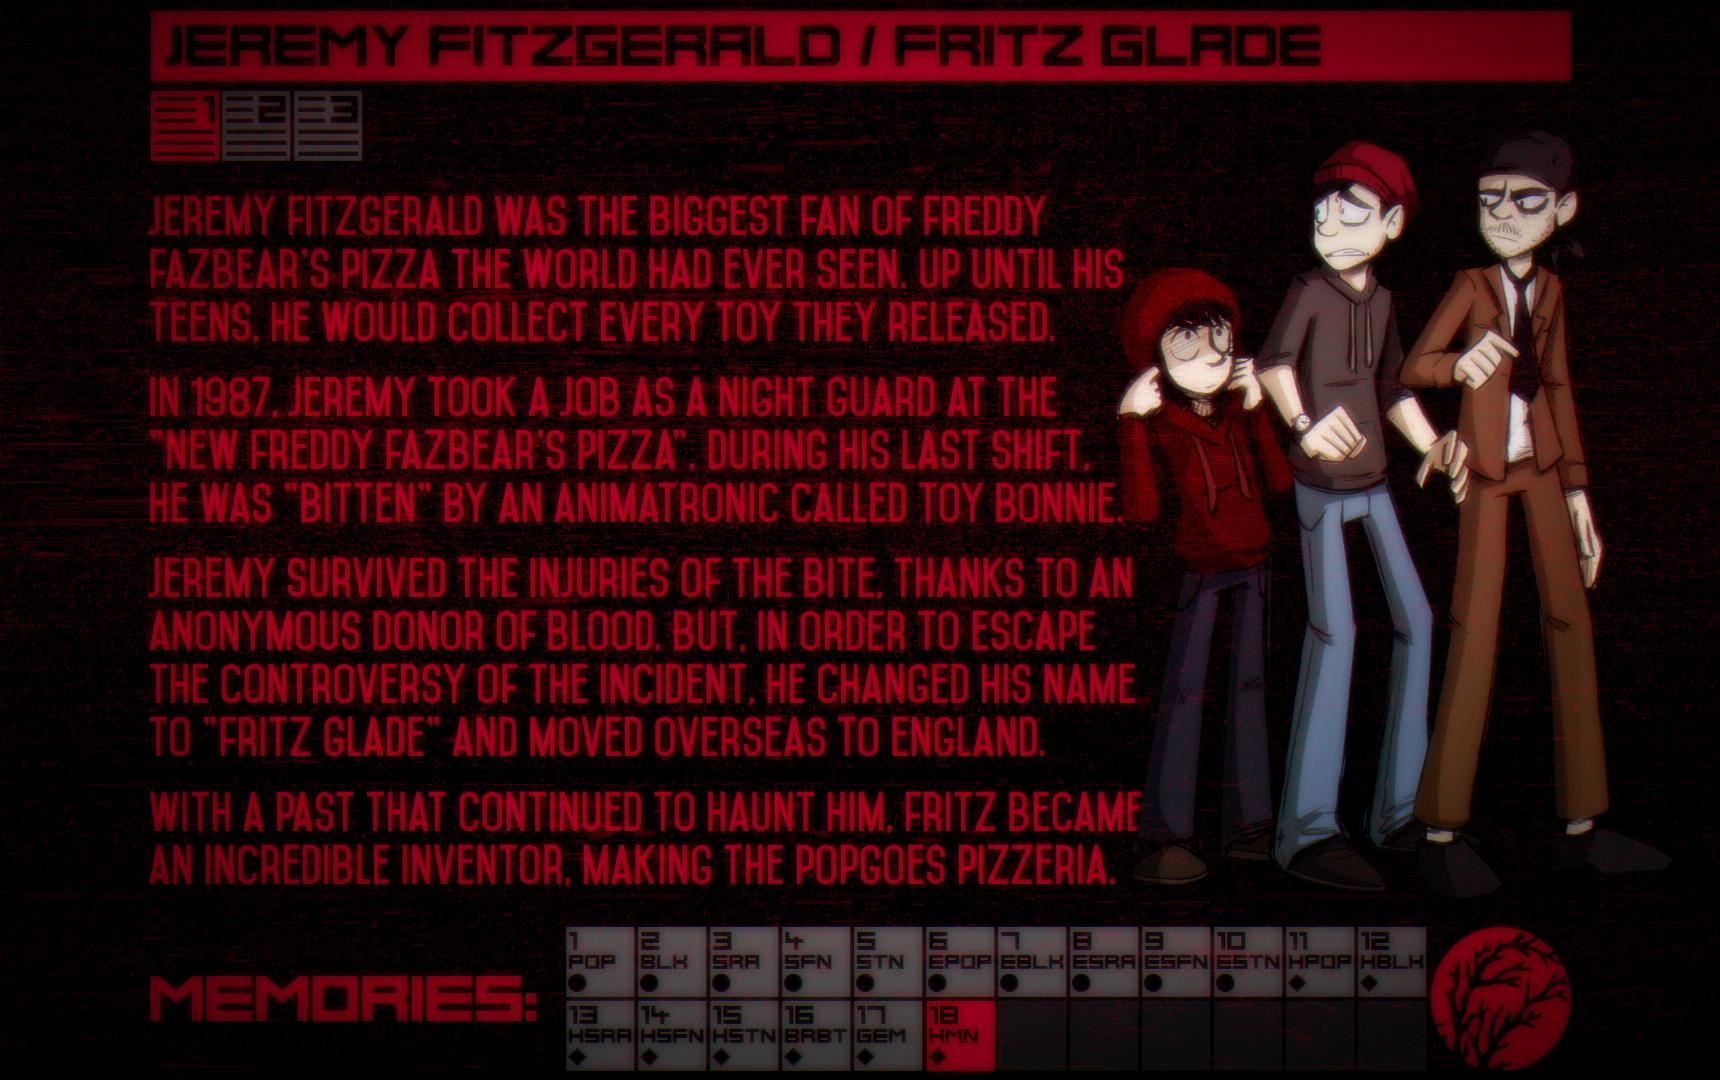 FritzMemory